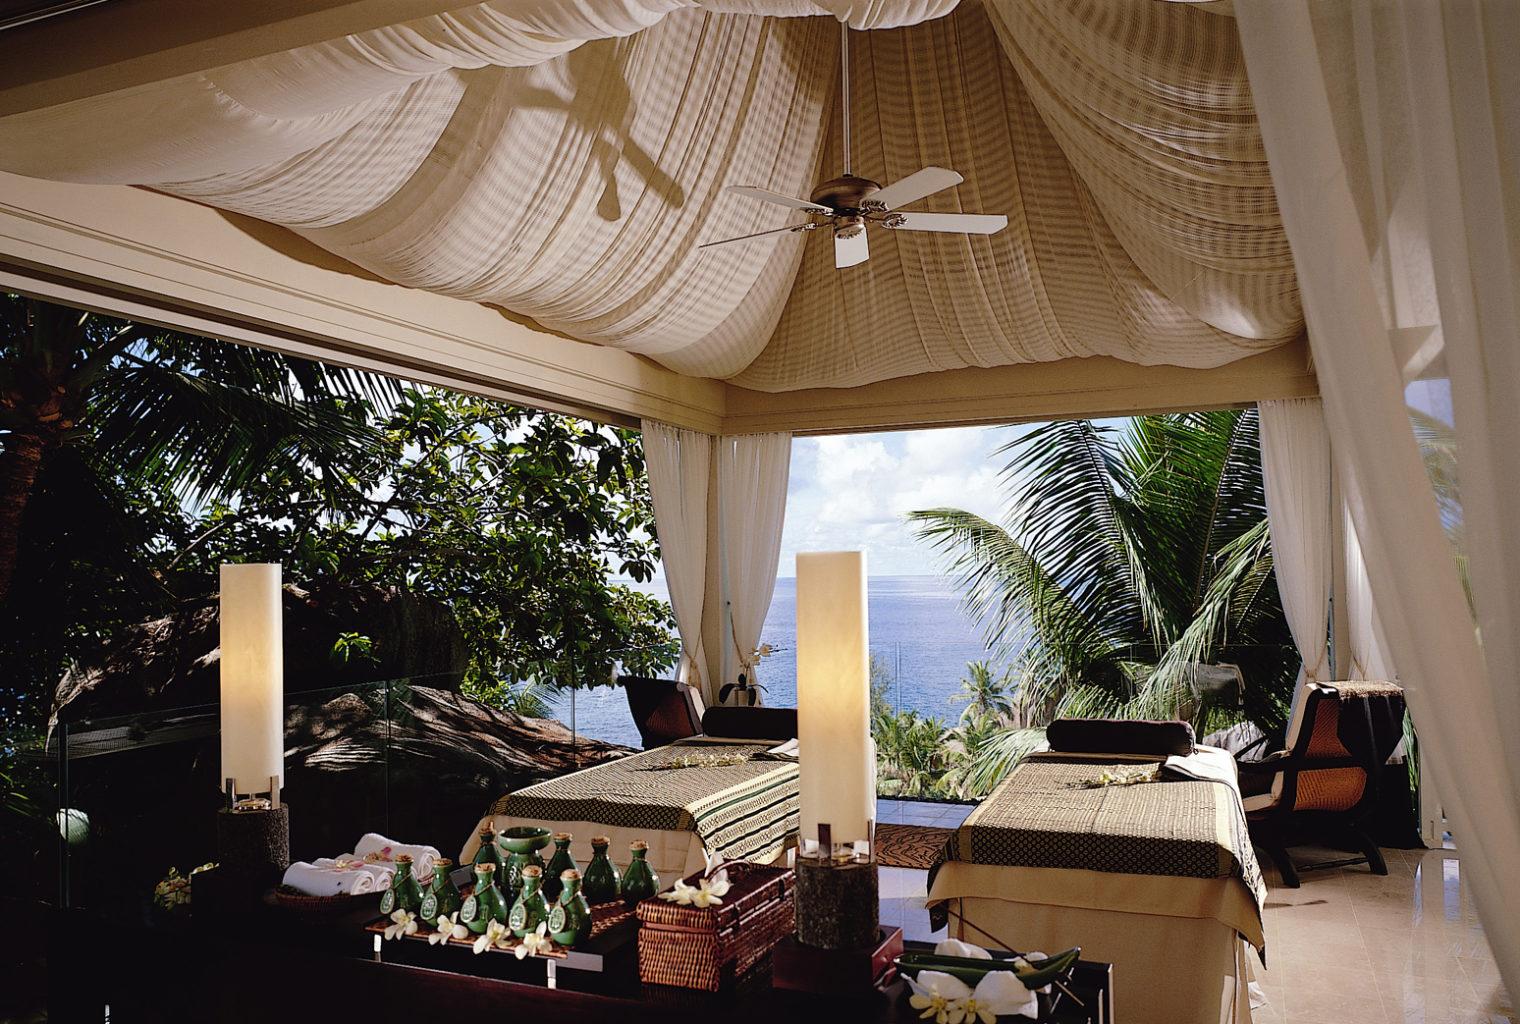 Banyan Tree Hotel Seychelles Spa Pavilion